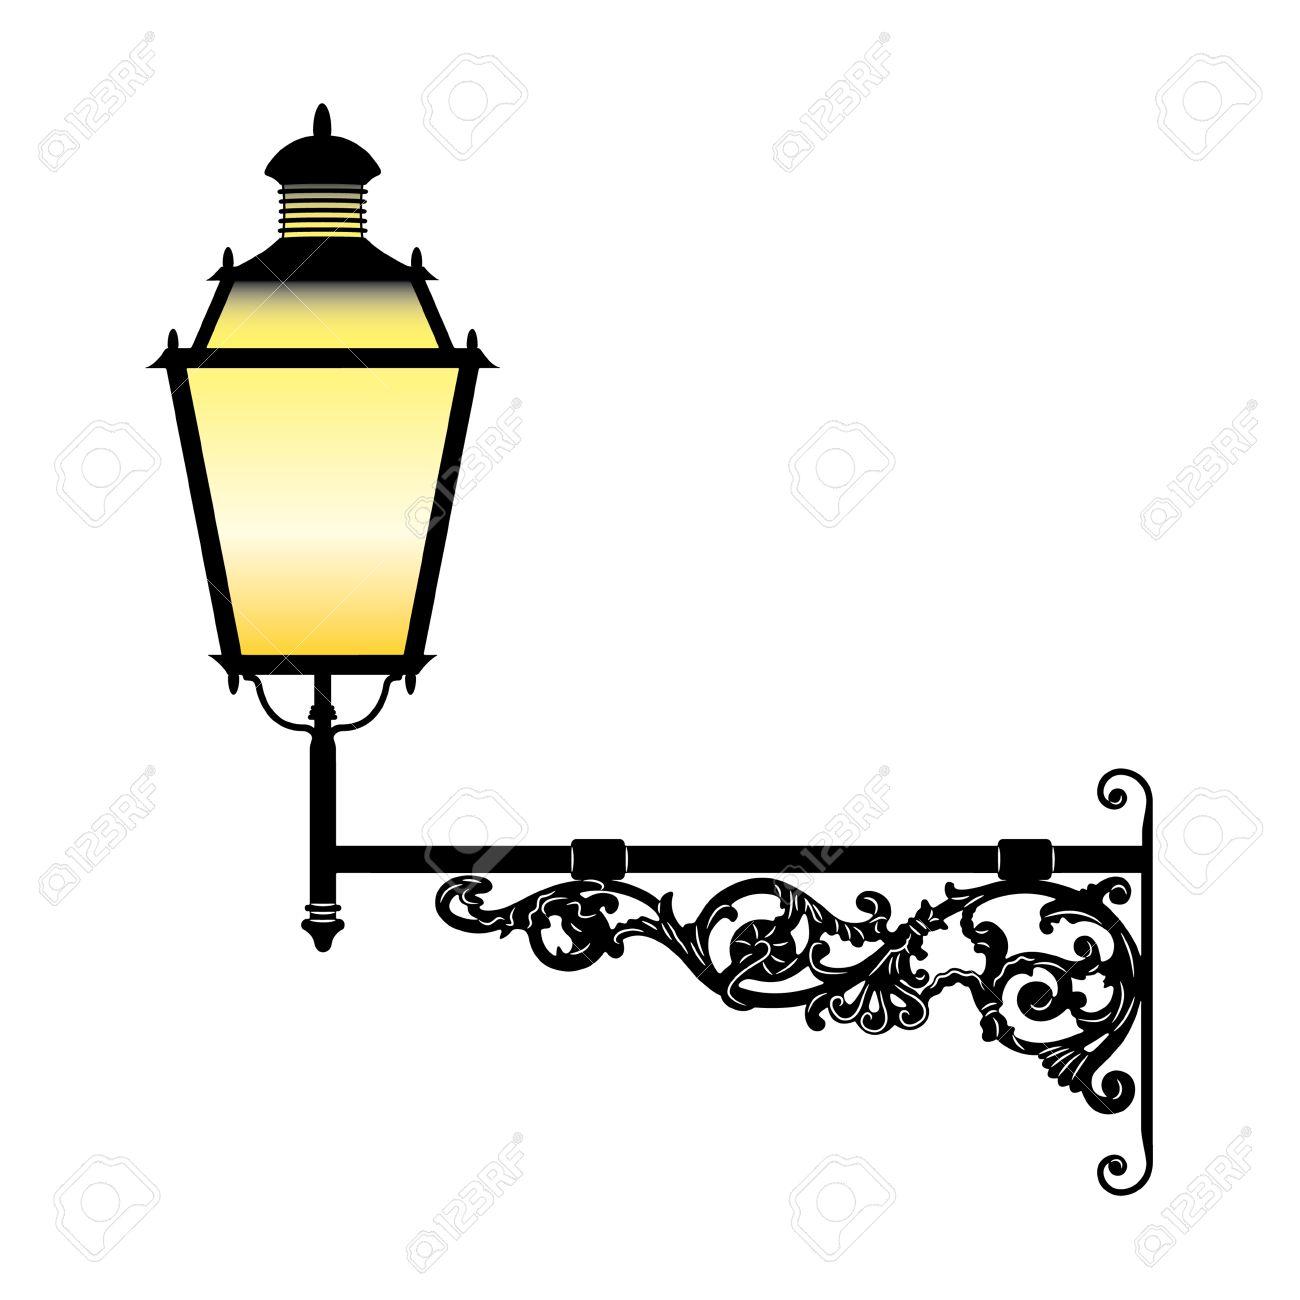 Italian forged iron elegant street lamp Stock Vector - 4141712